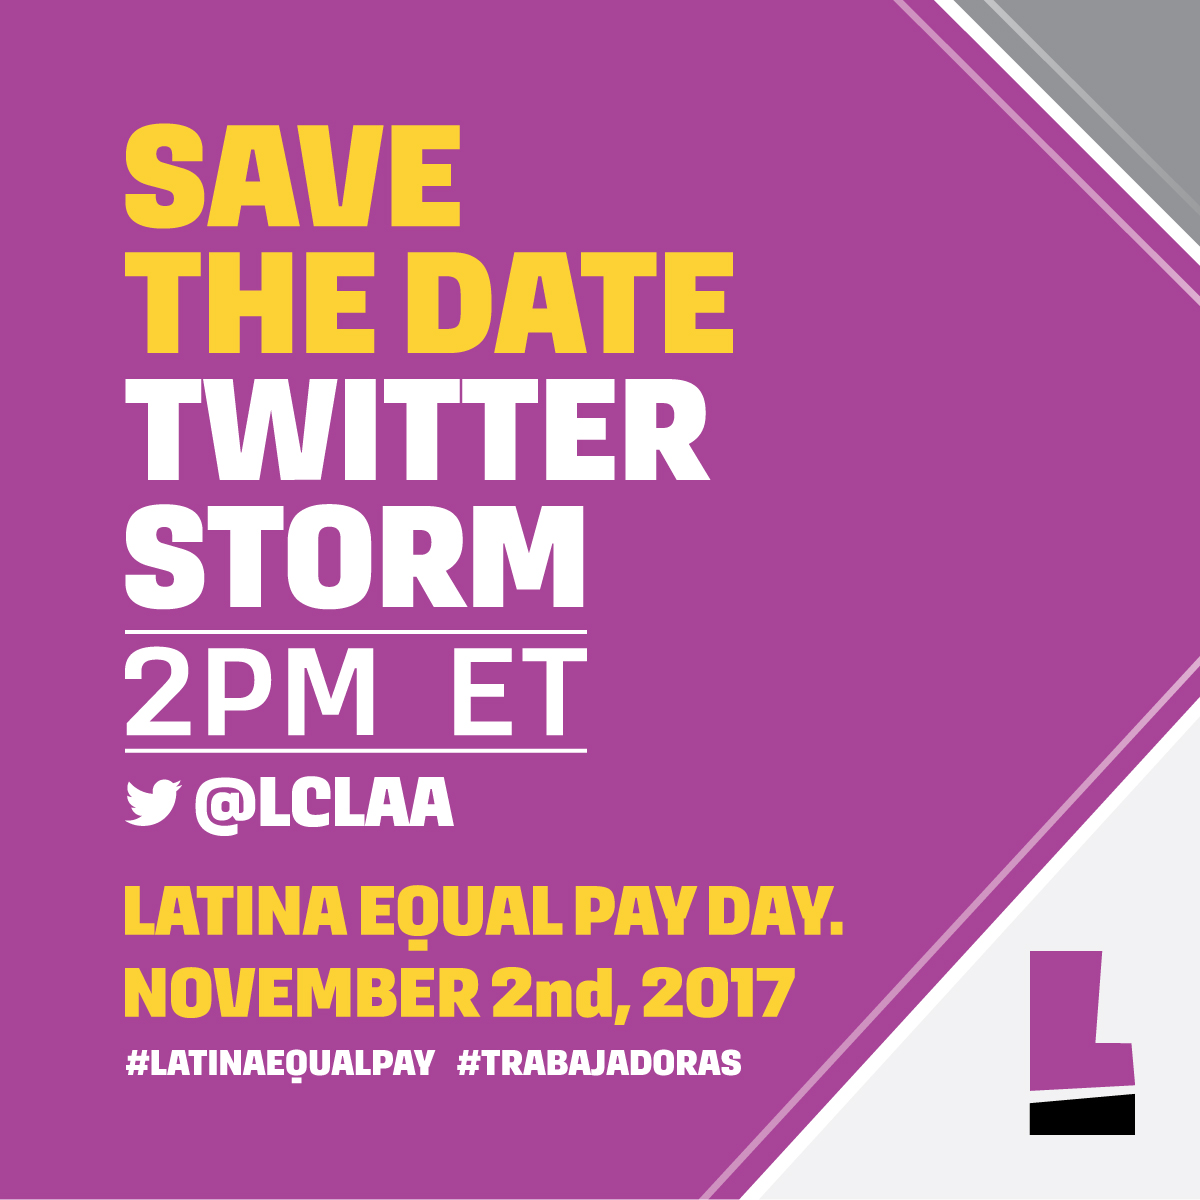 Latina-Equal-Pay-Twitter-Storm-Invitation 10.3.17 (1).jpg